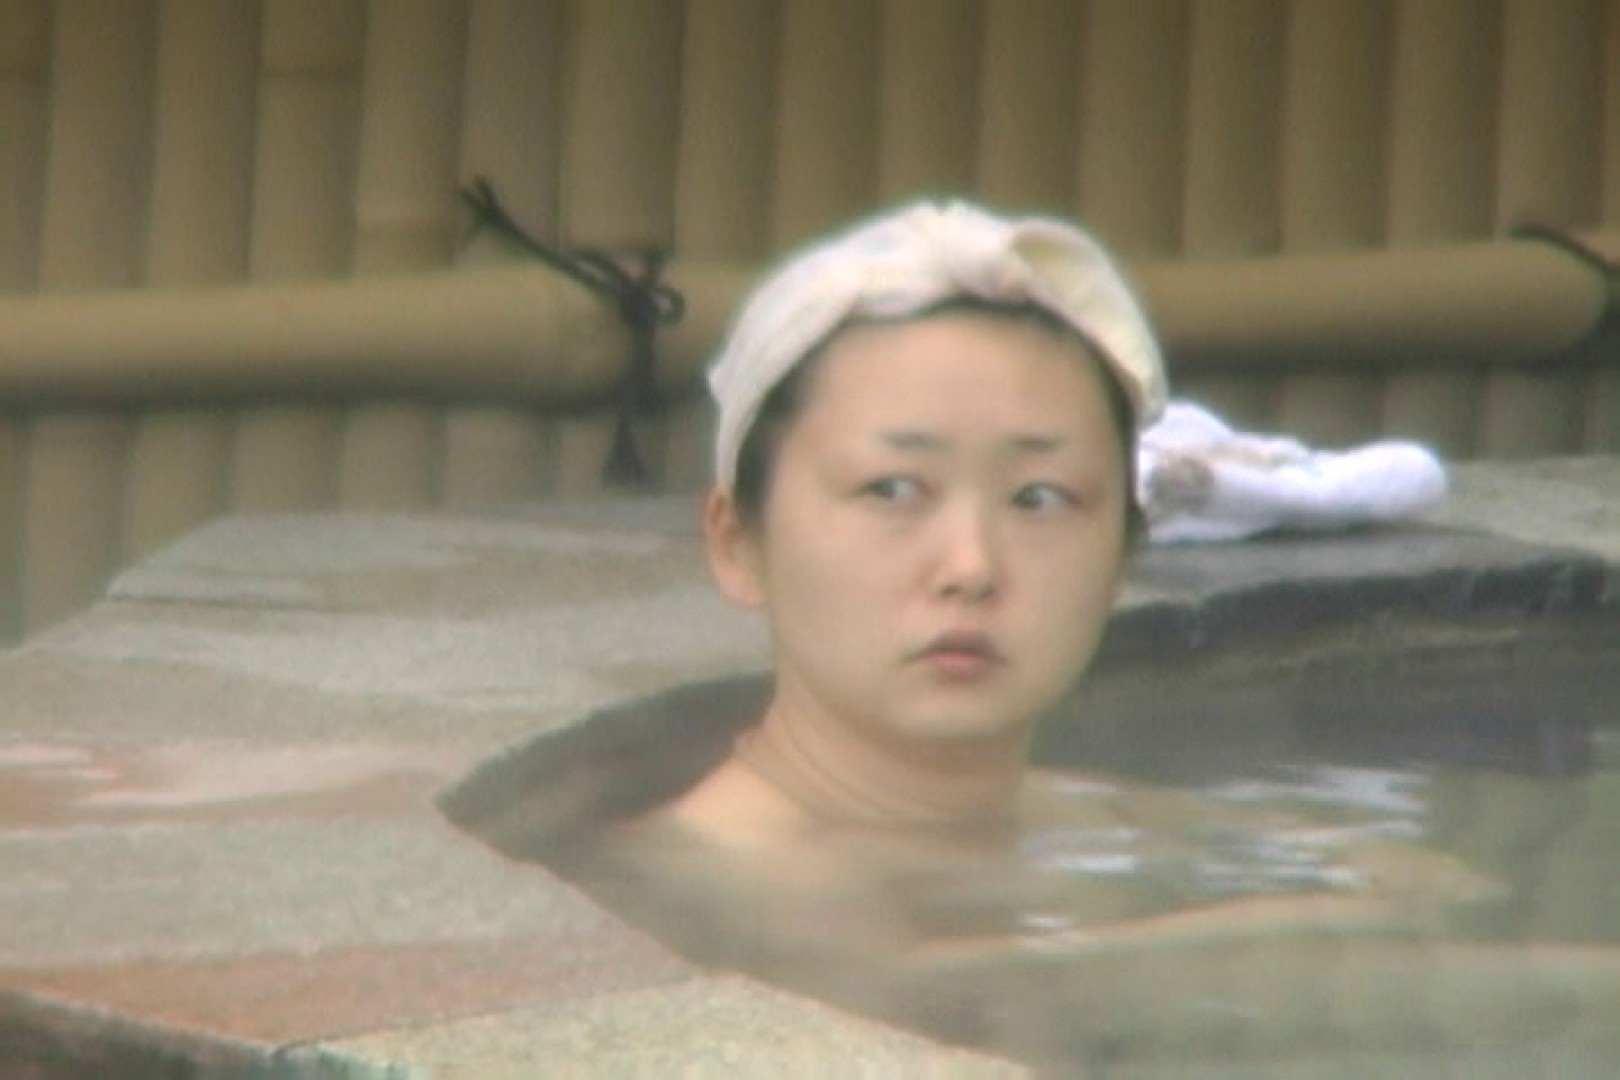 Aquaな露天風呂Vol.564 OL  87連発 64